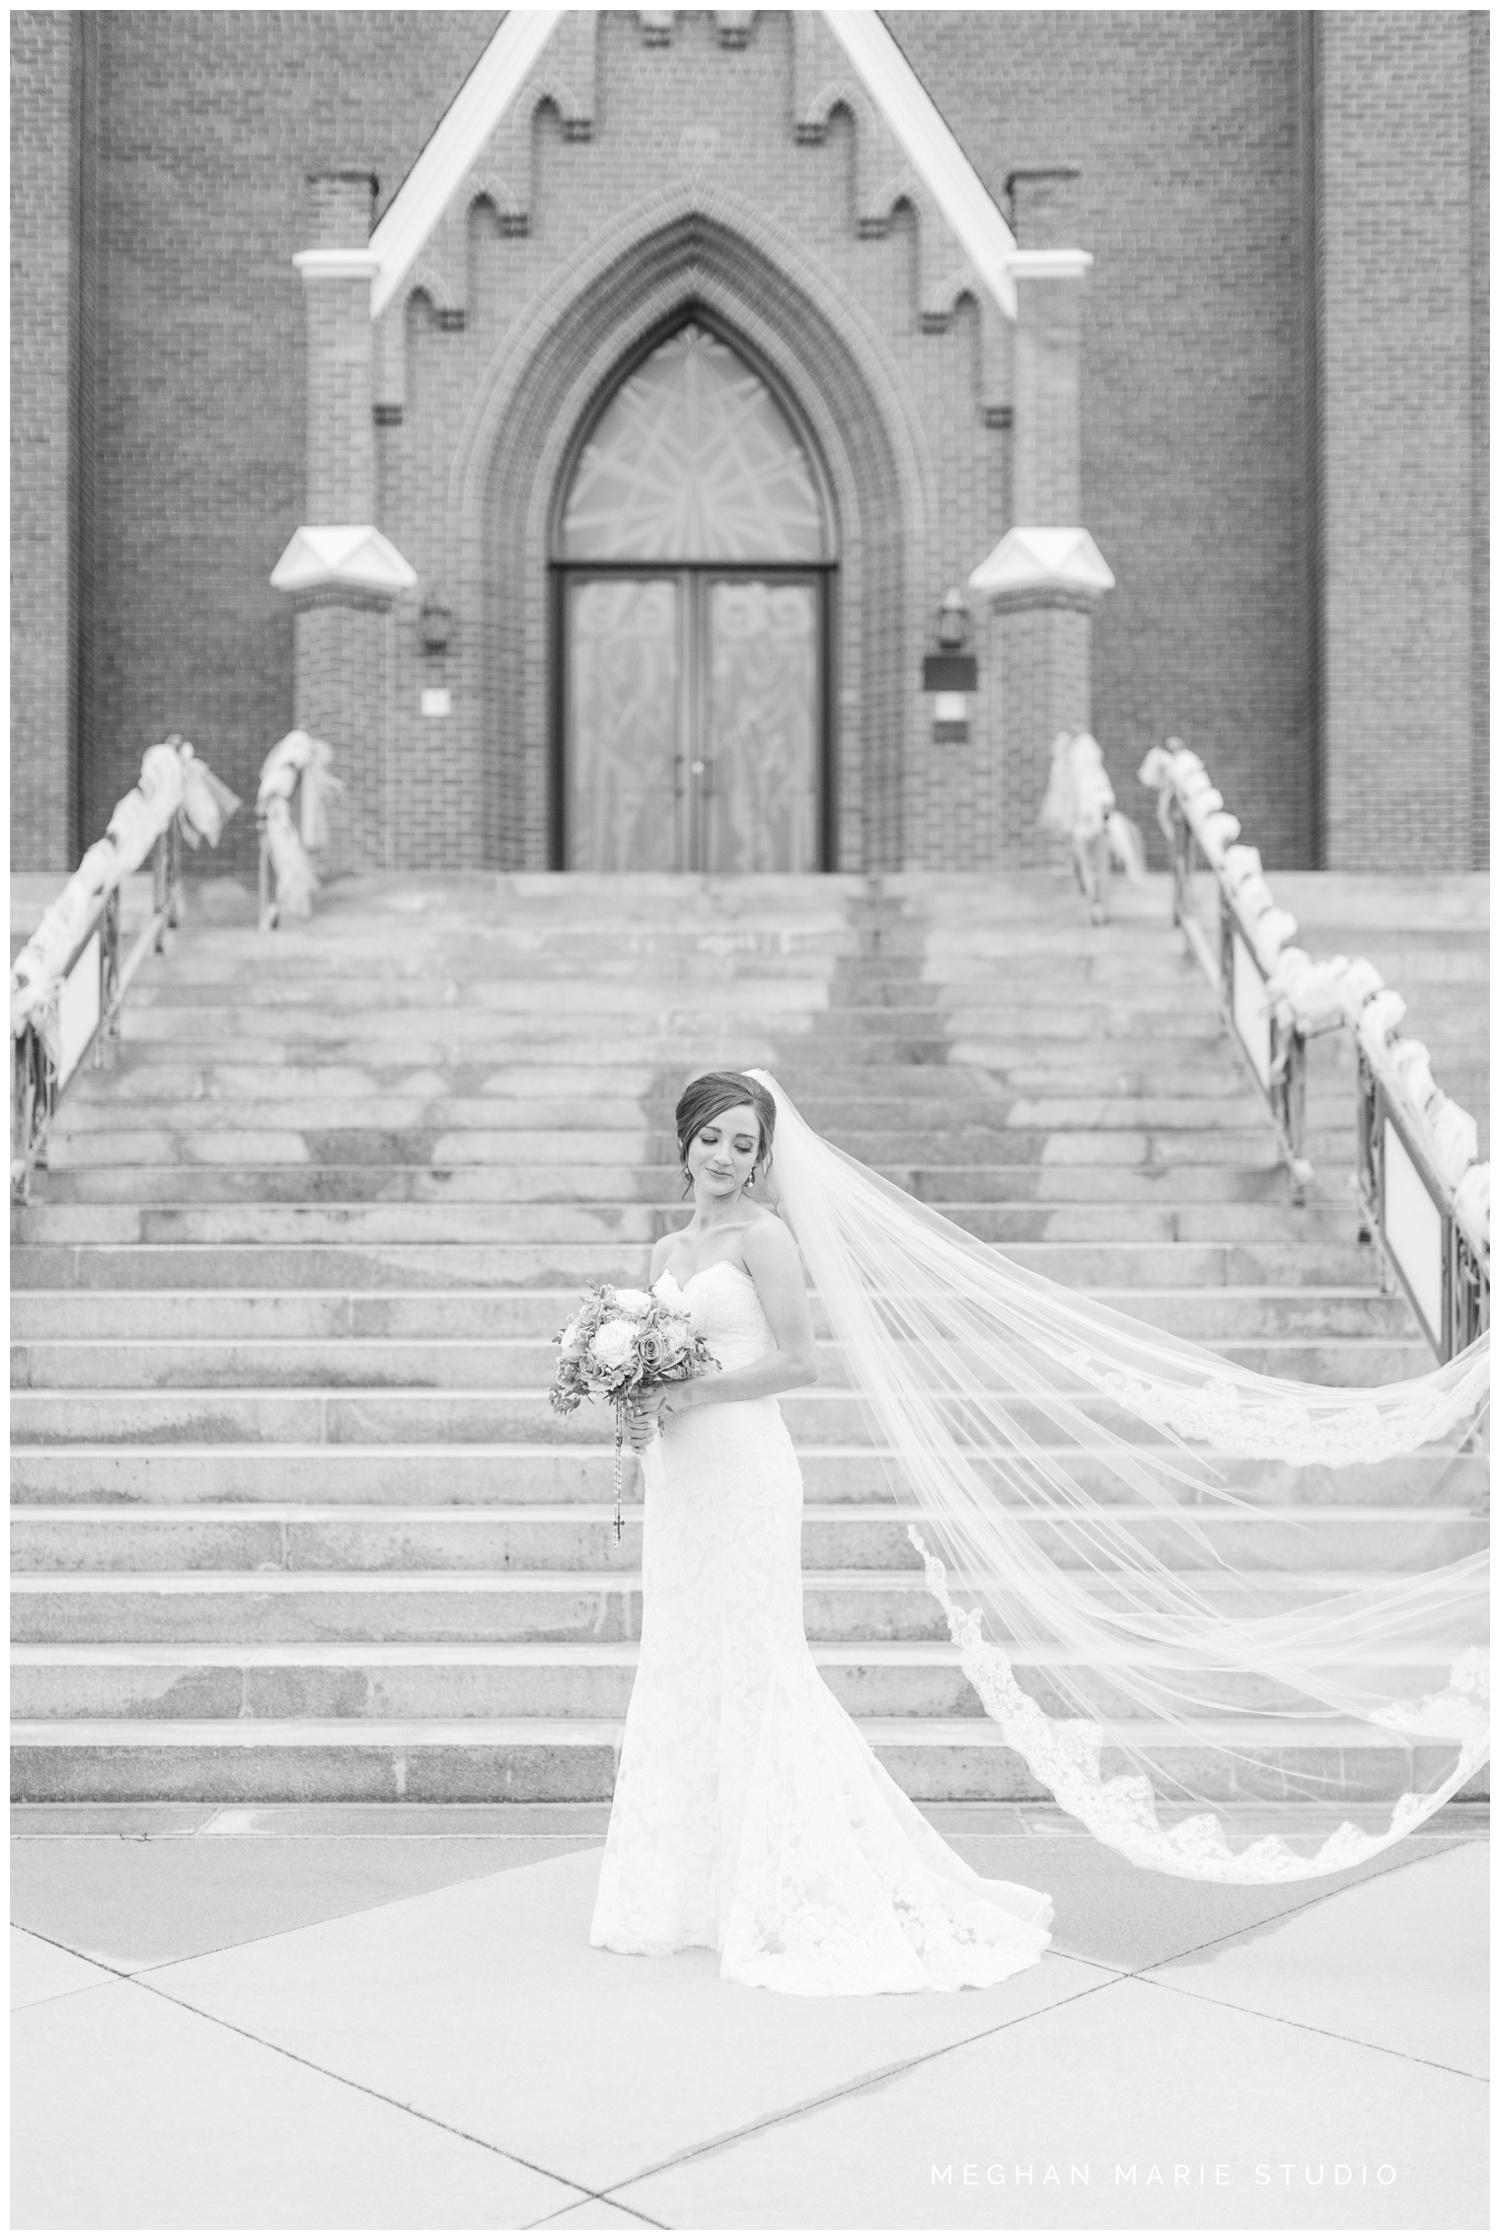 meghan marie studio wedding photographer ohio dayton cincinnati columbus minster st augustine dusty purple rose interracial couple romers catering_0721.jpg